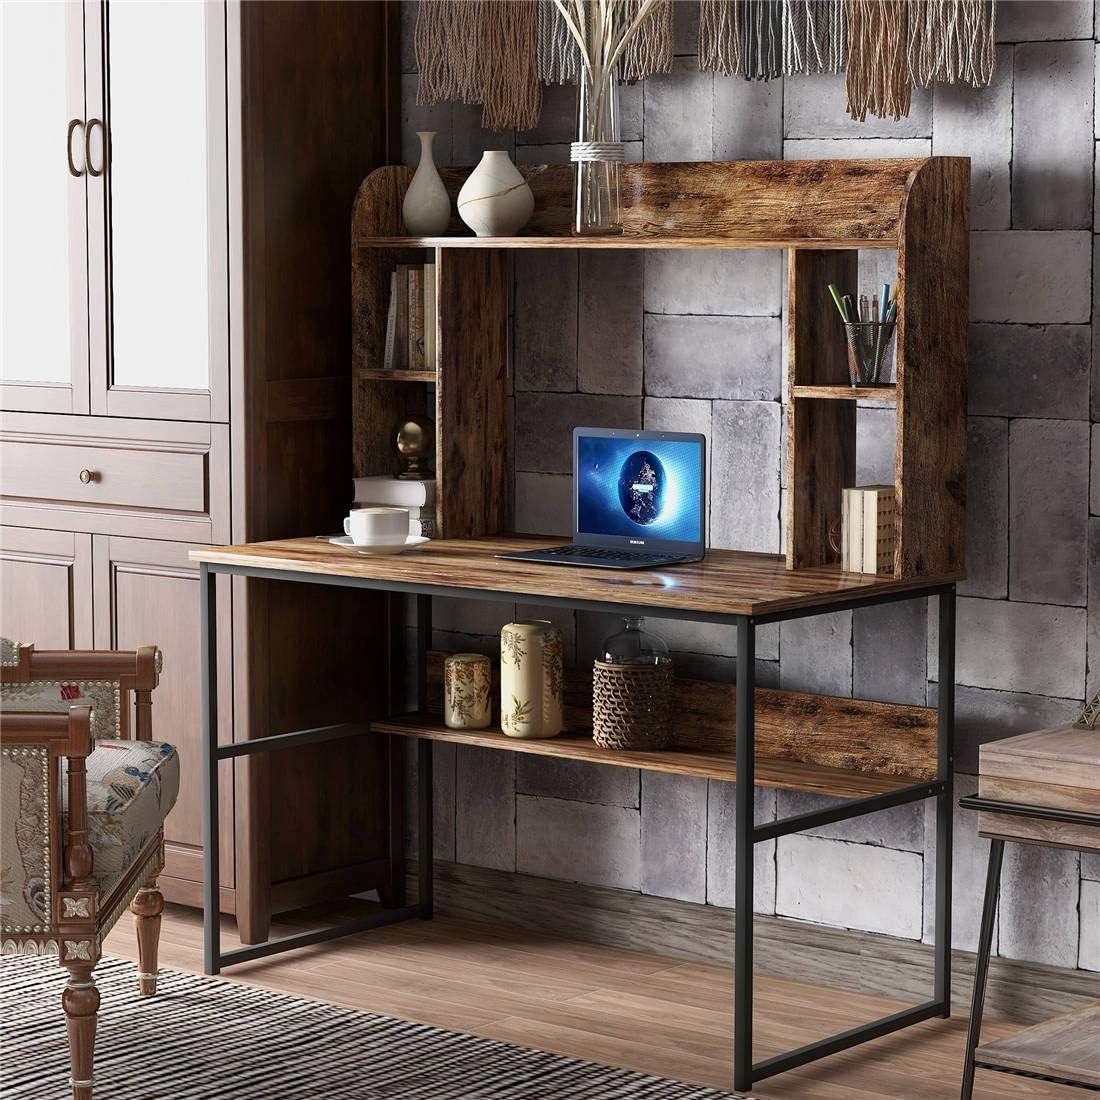 Amazon.com: 47.2''L- Home Office Computer Desk with Hutch Storage Shelves  Computer Table Metal Frame Wooden Desktop New Modern Design (47.2''L-  Rustic): Kitchen & Dining